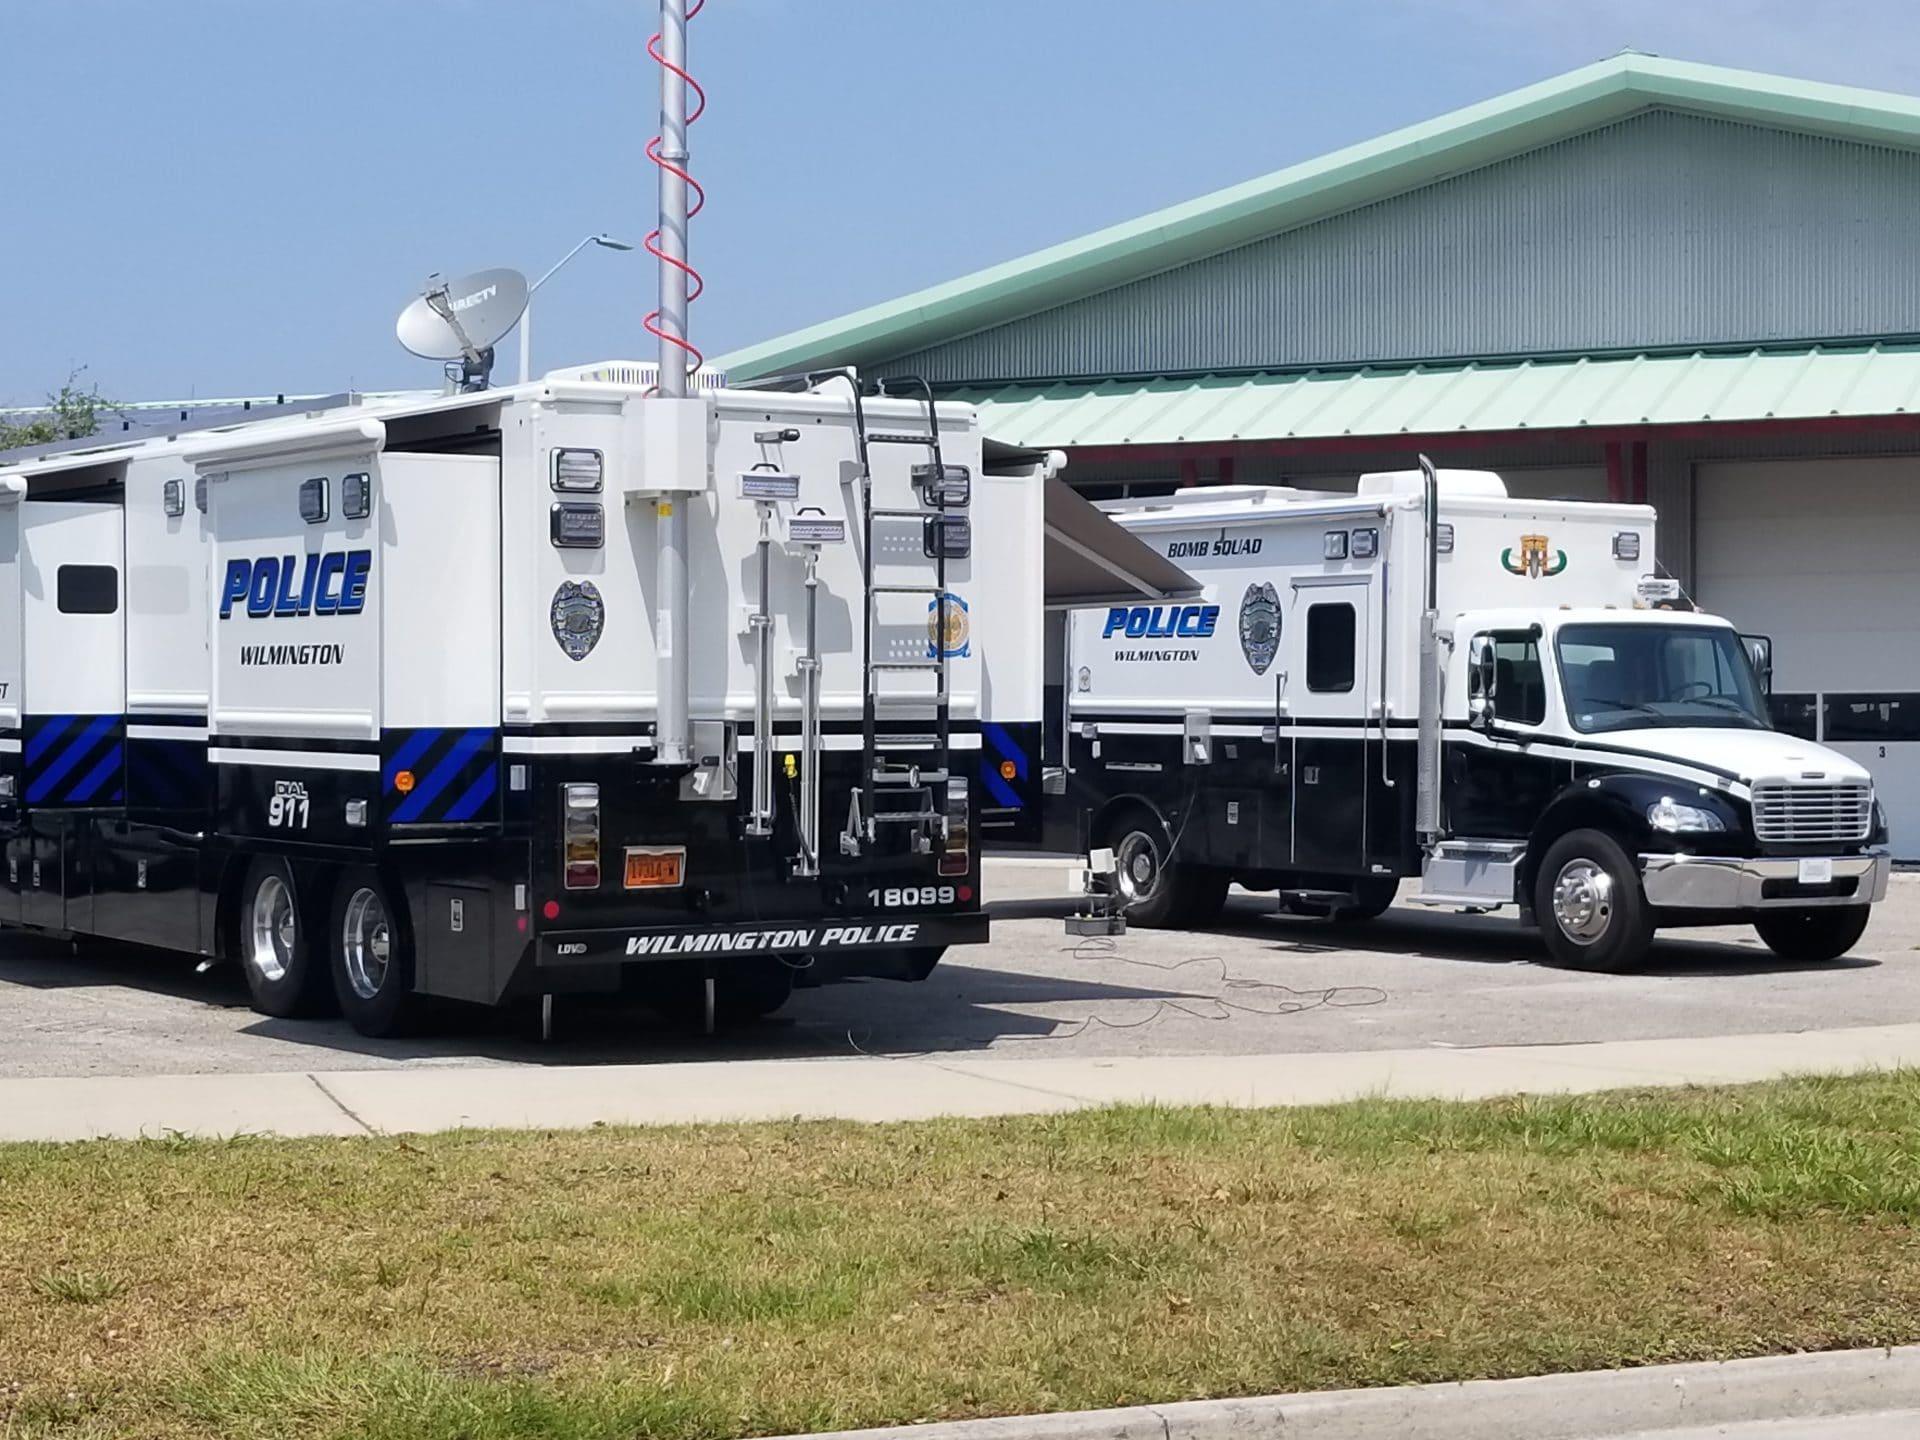 LDV-Wilmington Police Bomb Squad Truck